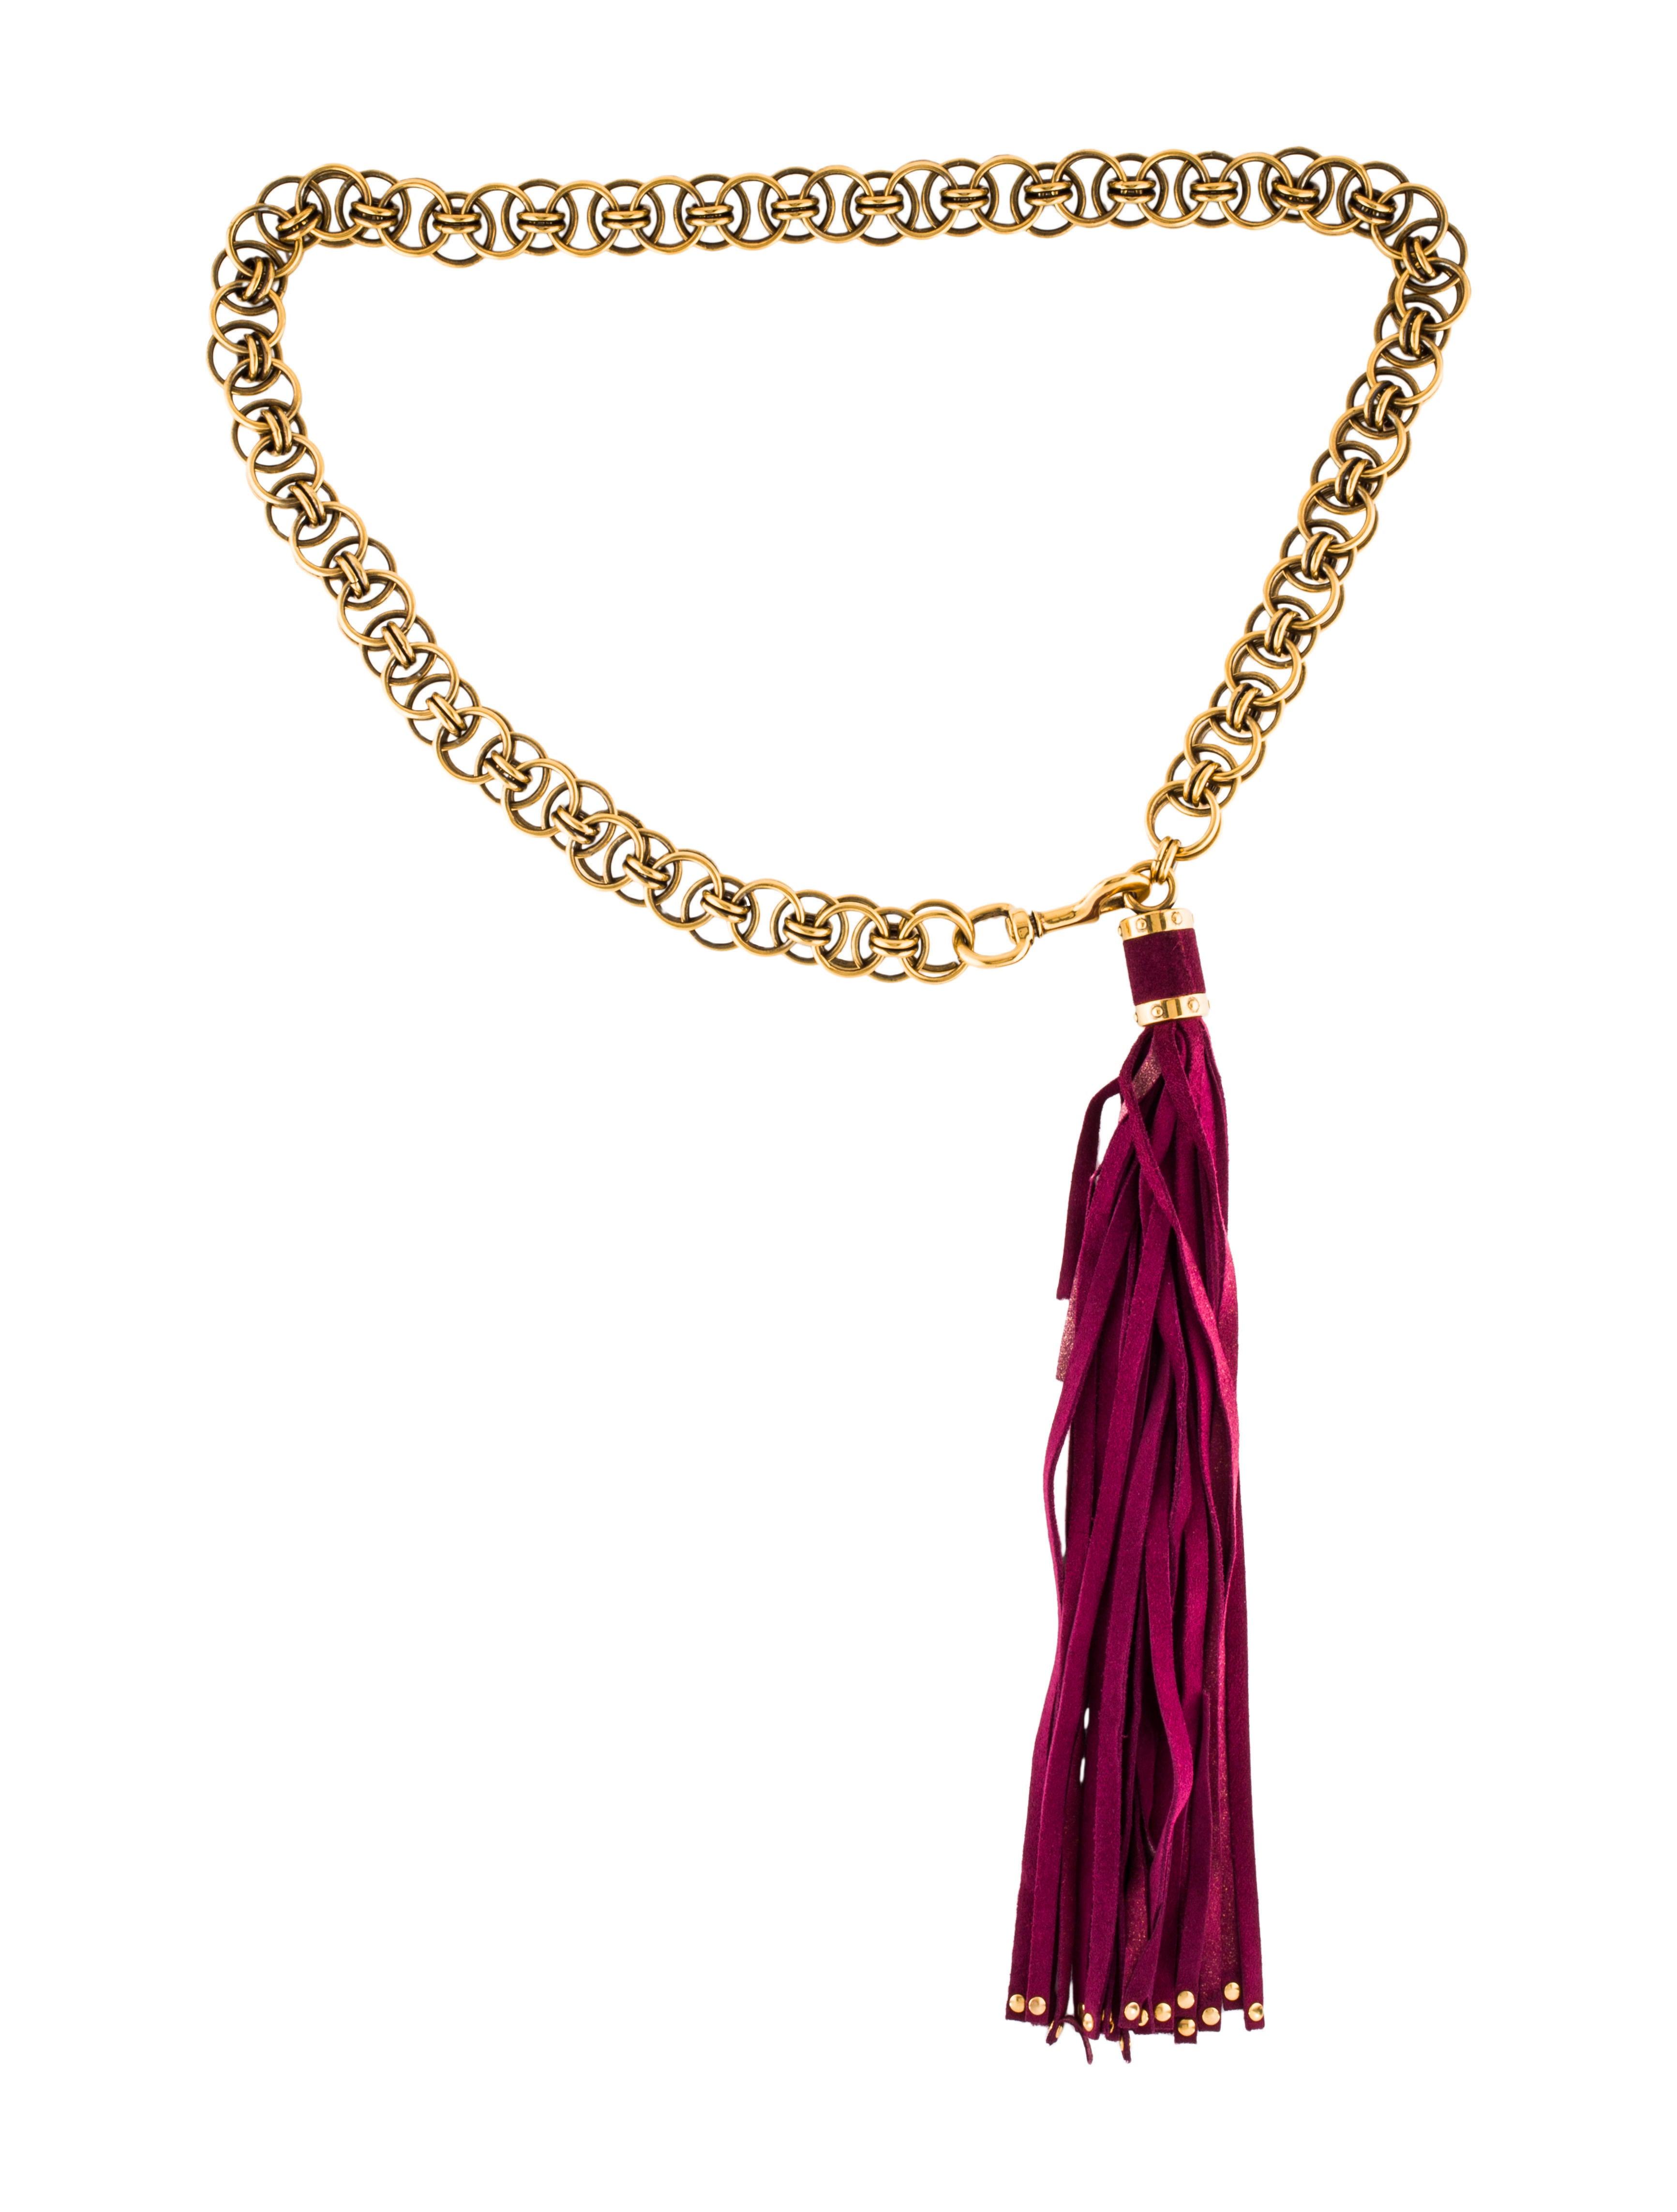 afbbf5858e8 Gucci Chain Tassel Belt - Accessories - GUC225561